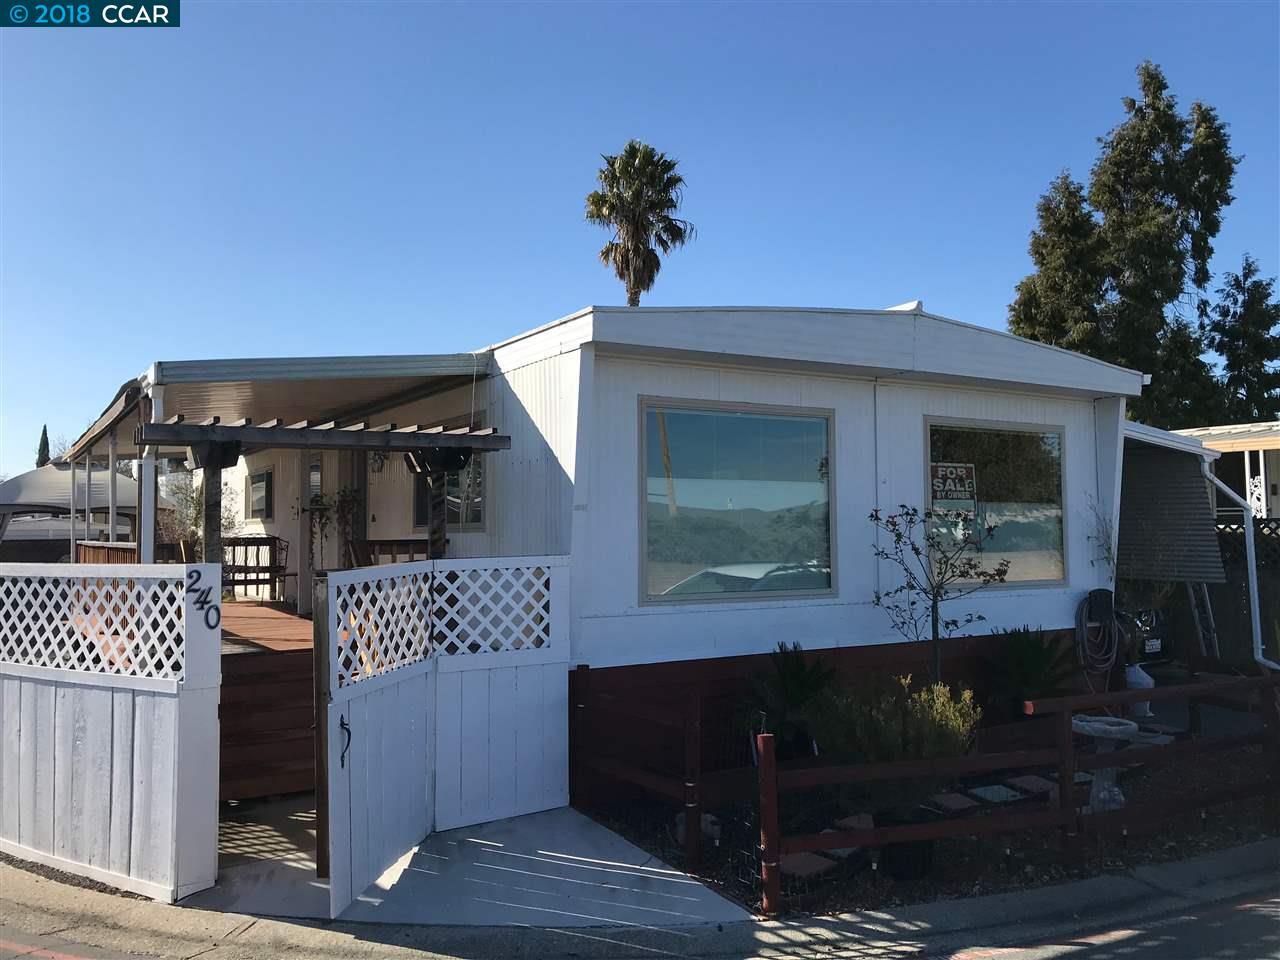 واحد منزل الأسرة للـ Sale في 240 Faran Drive 240 Faran Drive Pacheco, California 94553 United States